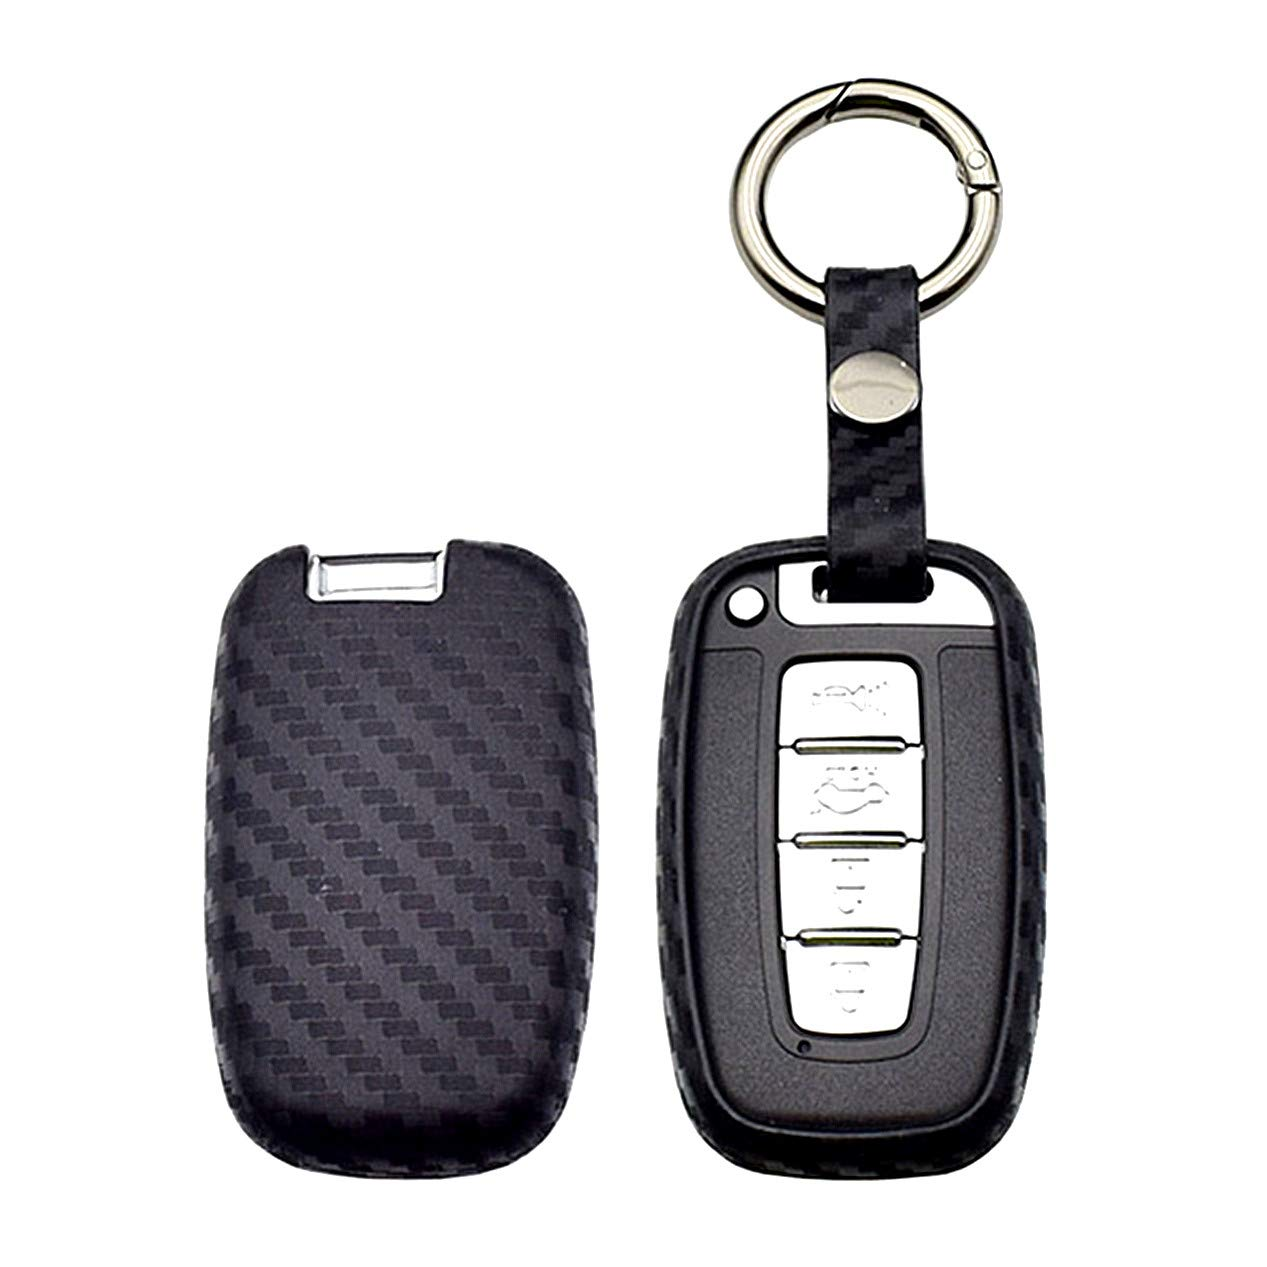 Mokie 2-Pcs Silicone Key Fob Case,Skin Cover Protector for Hyundai Elantra Sonata Tucson I40 IX35 I45 Smart 4 Buttons Hyundai Elantra Sonata Tucson I40 IX35 I45 Smart 7 Buttons